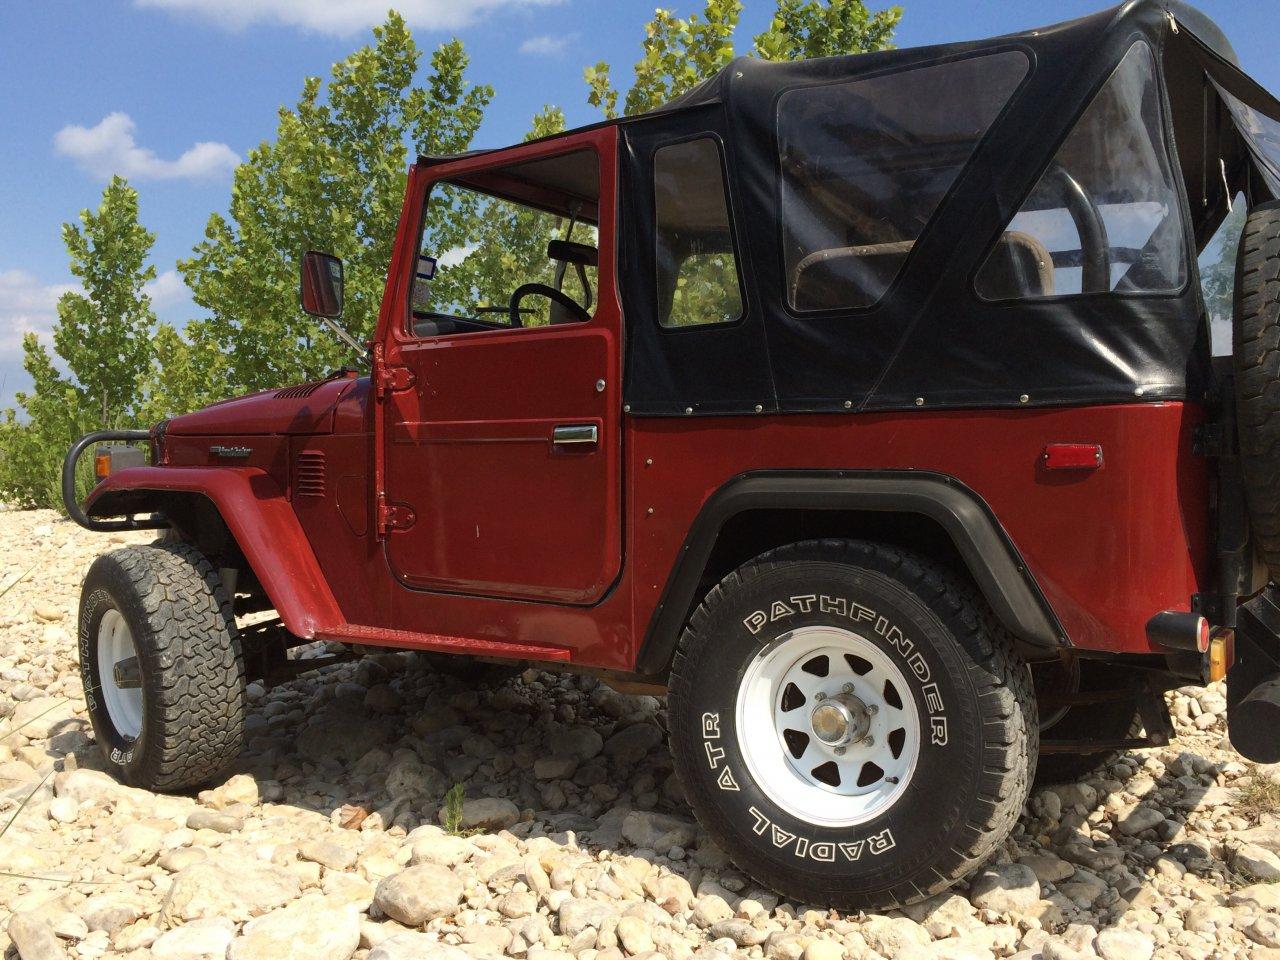 craigslist - 1976 FJ 40 for sale Texas San Antonio area ...